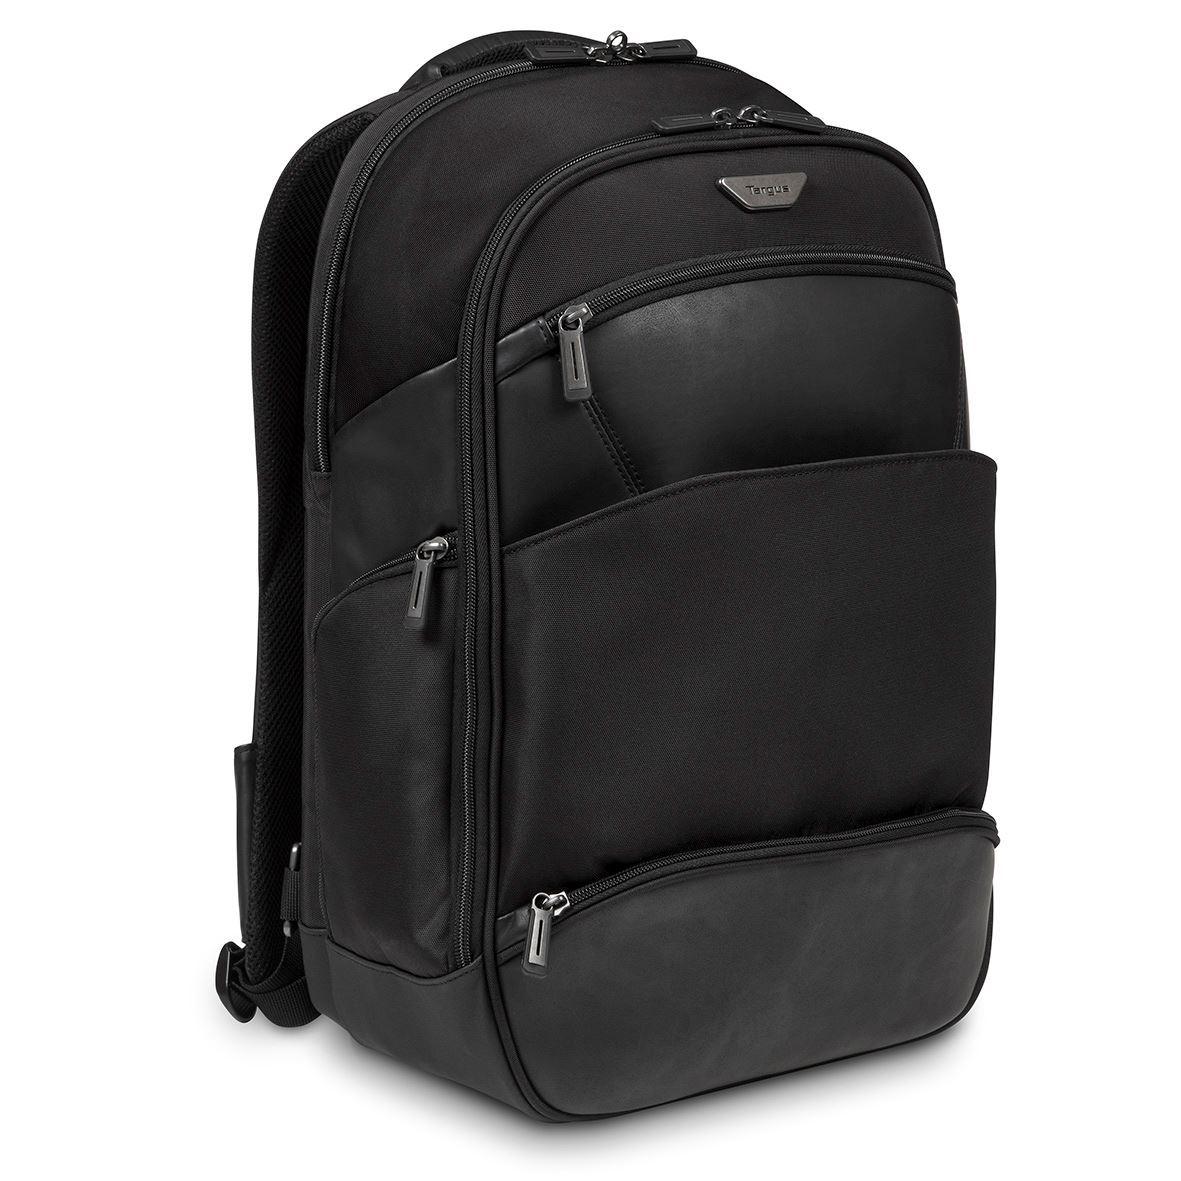 sac dos pour ordinateur portable targus mobile vip 12 15. Black Bedroom Furniture Sets. Home Design Ideas